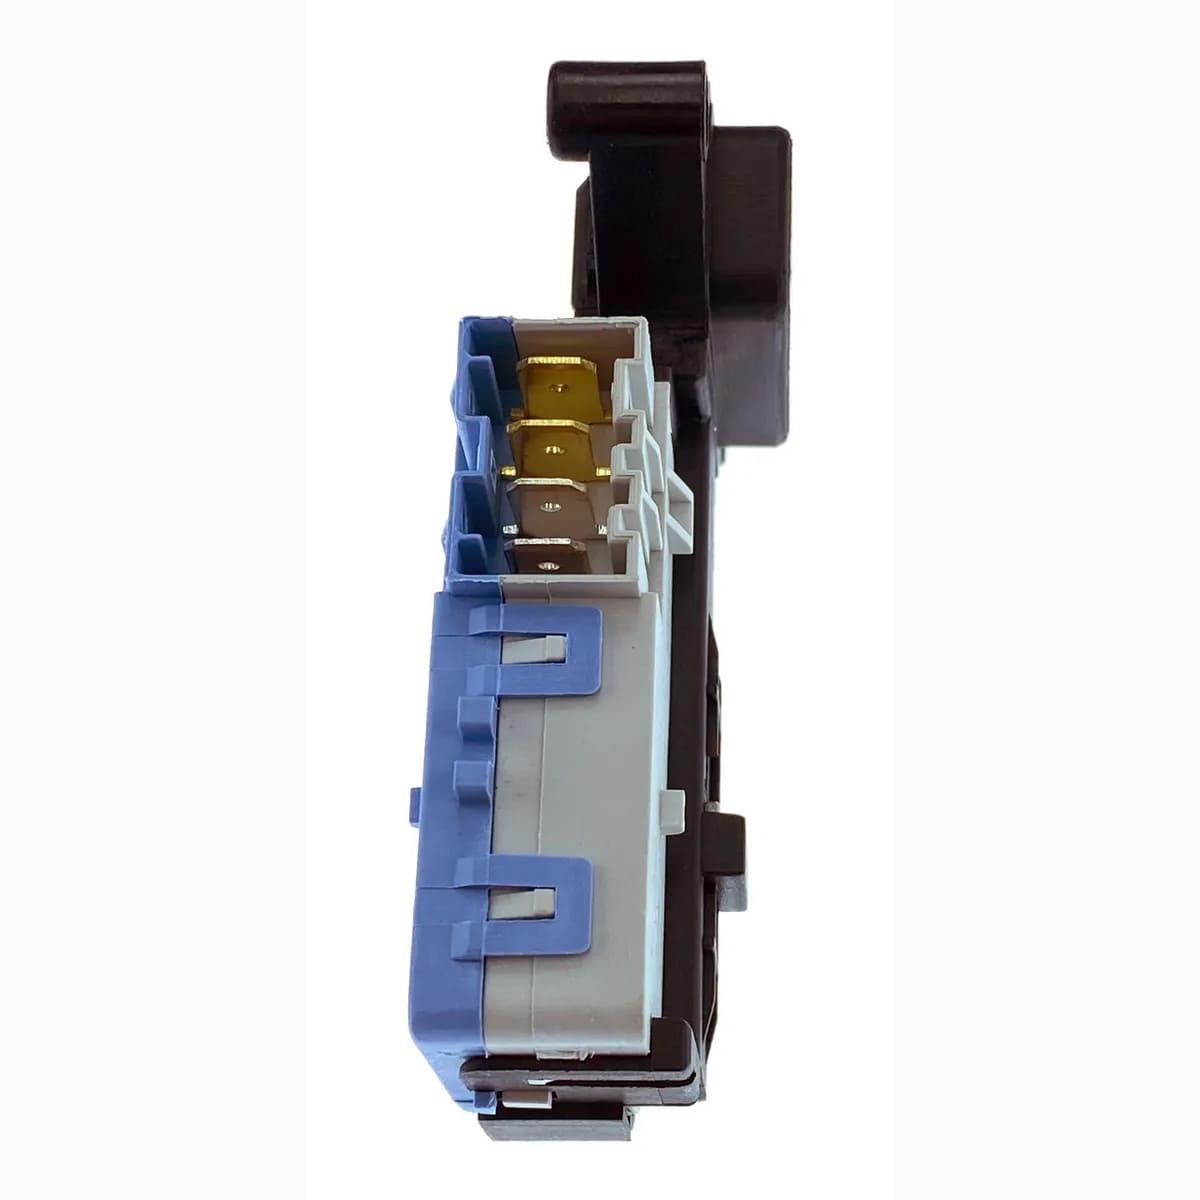 Trava Porta Electrolux Lava Seca Lsi09 Lse09 110v - 3619047210